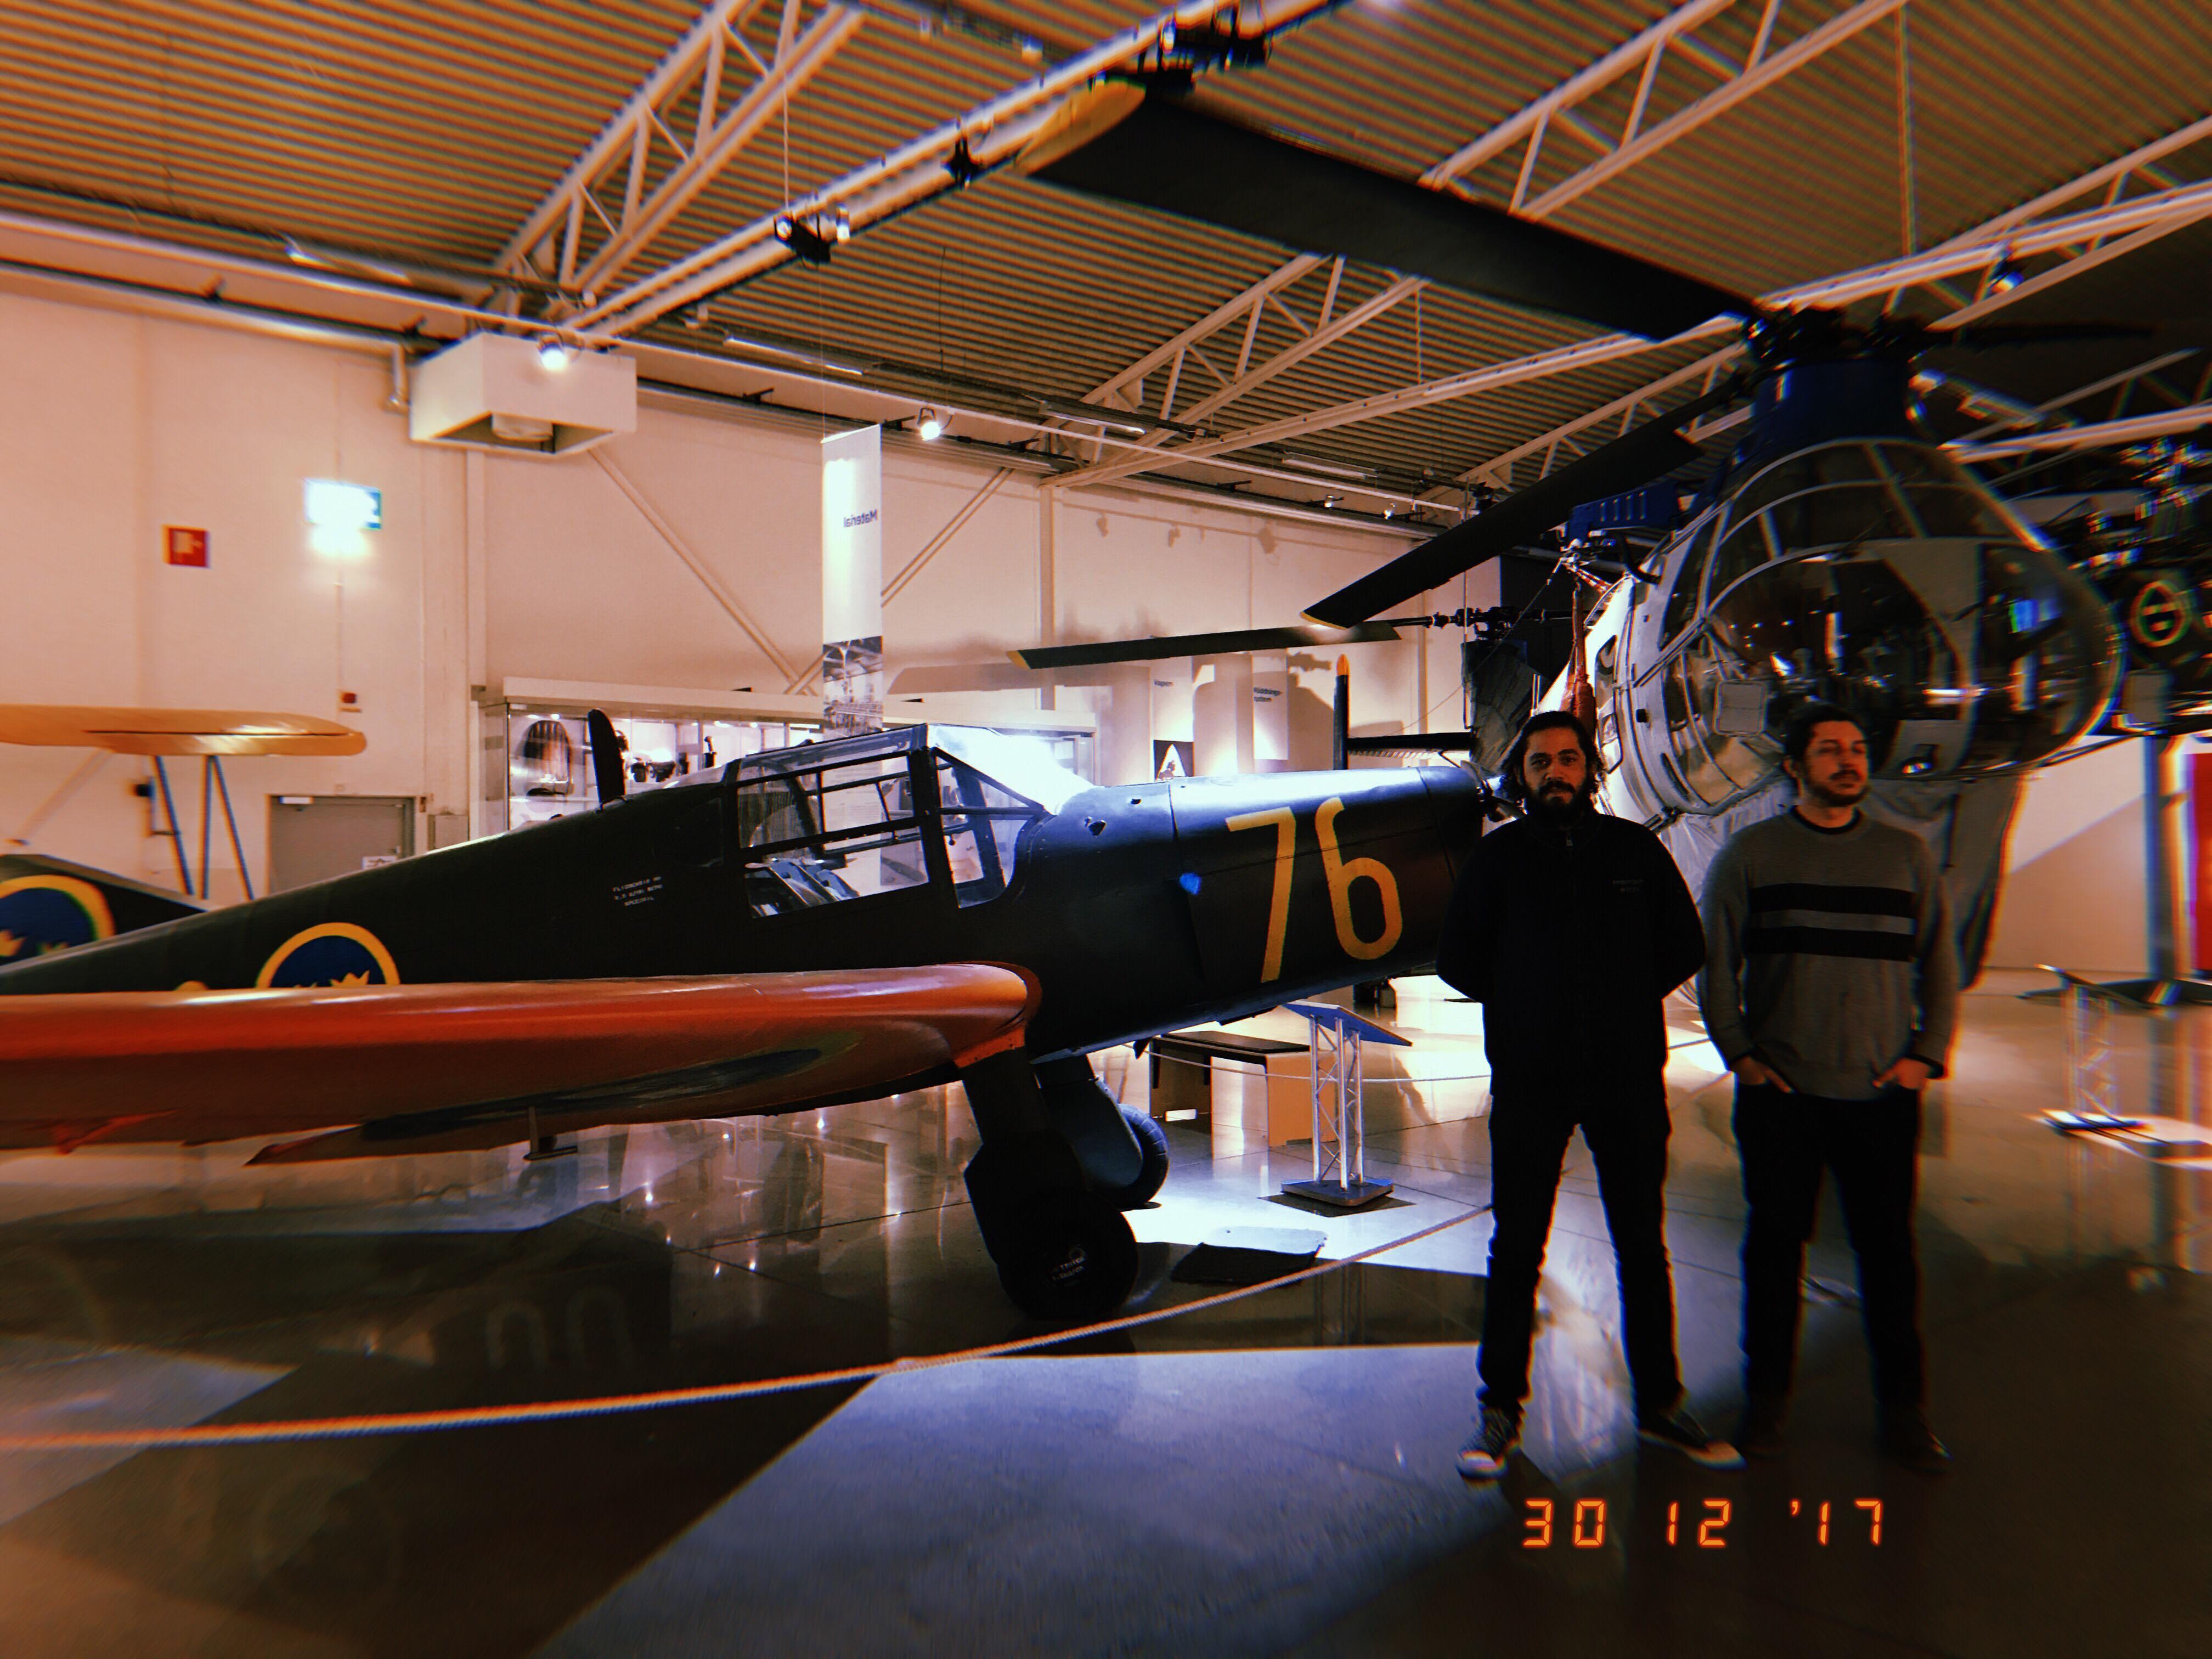 museu da forca aerea da suecia